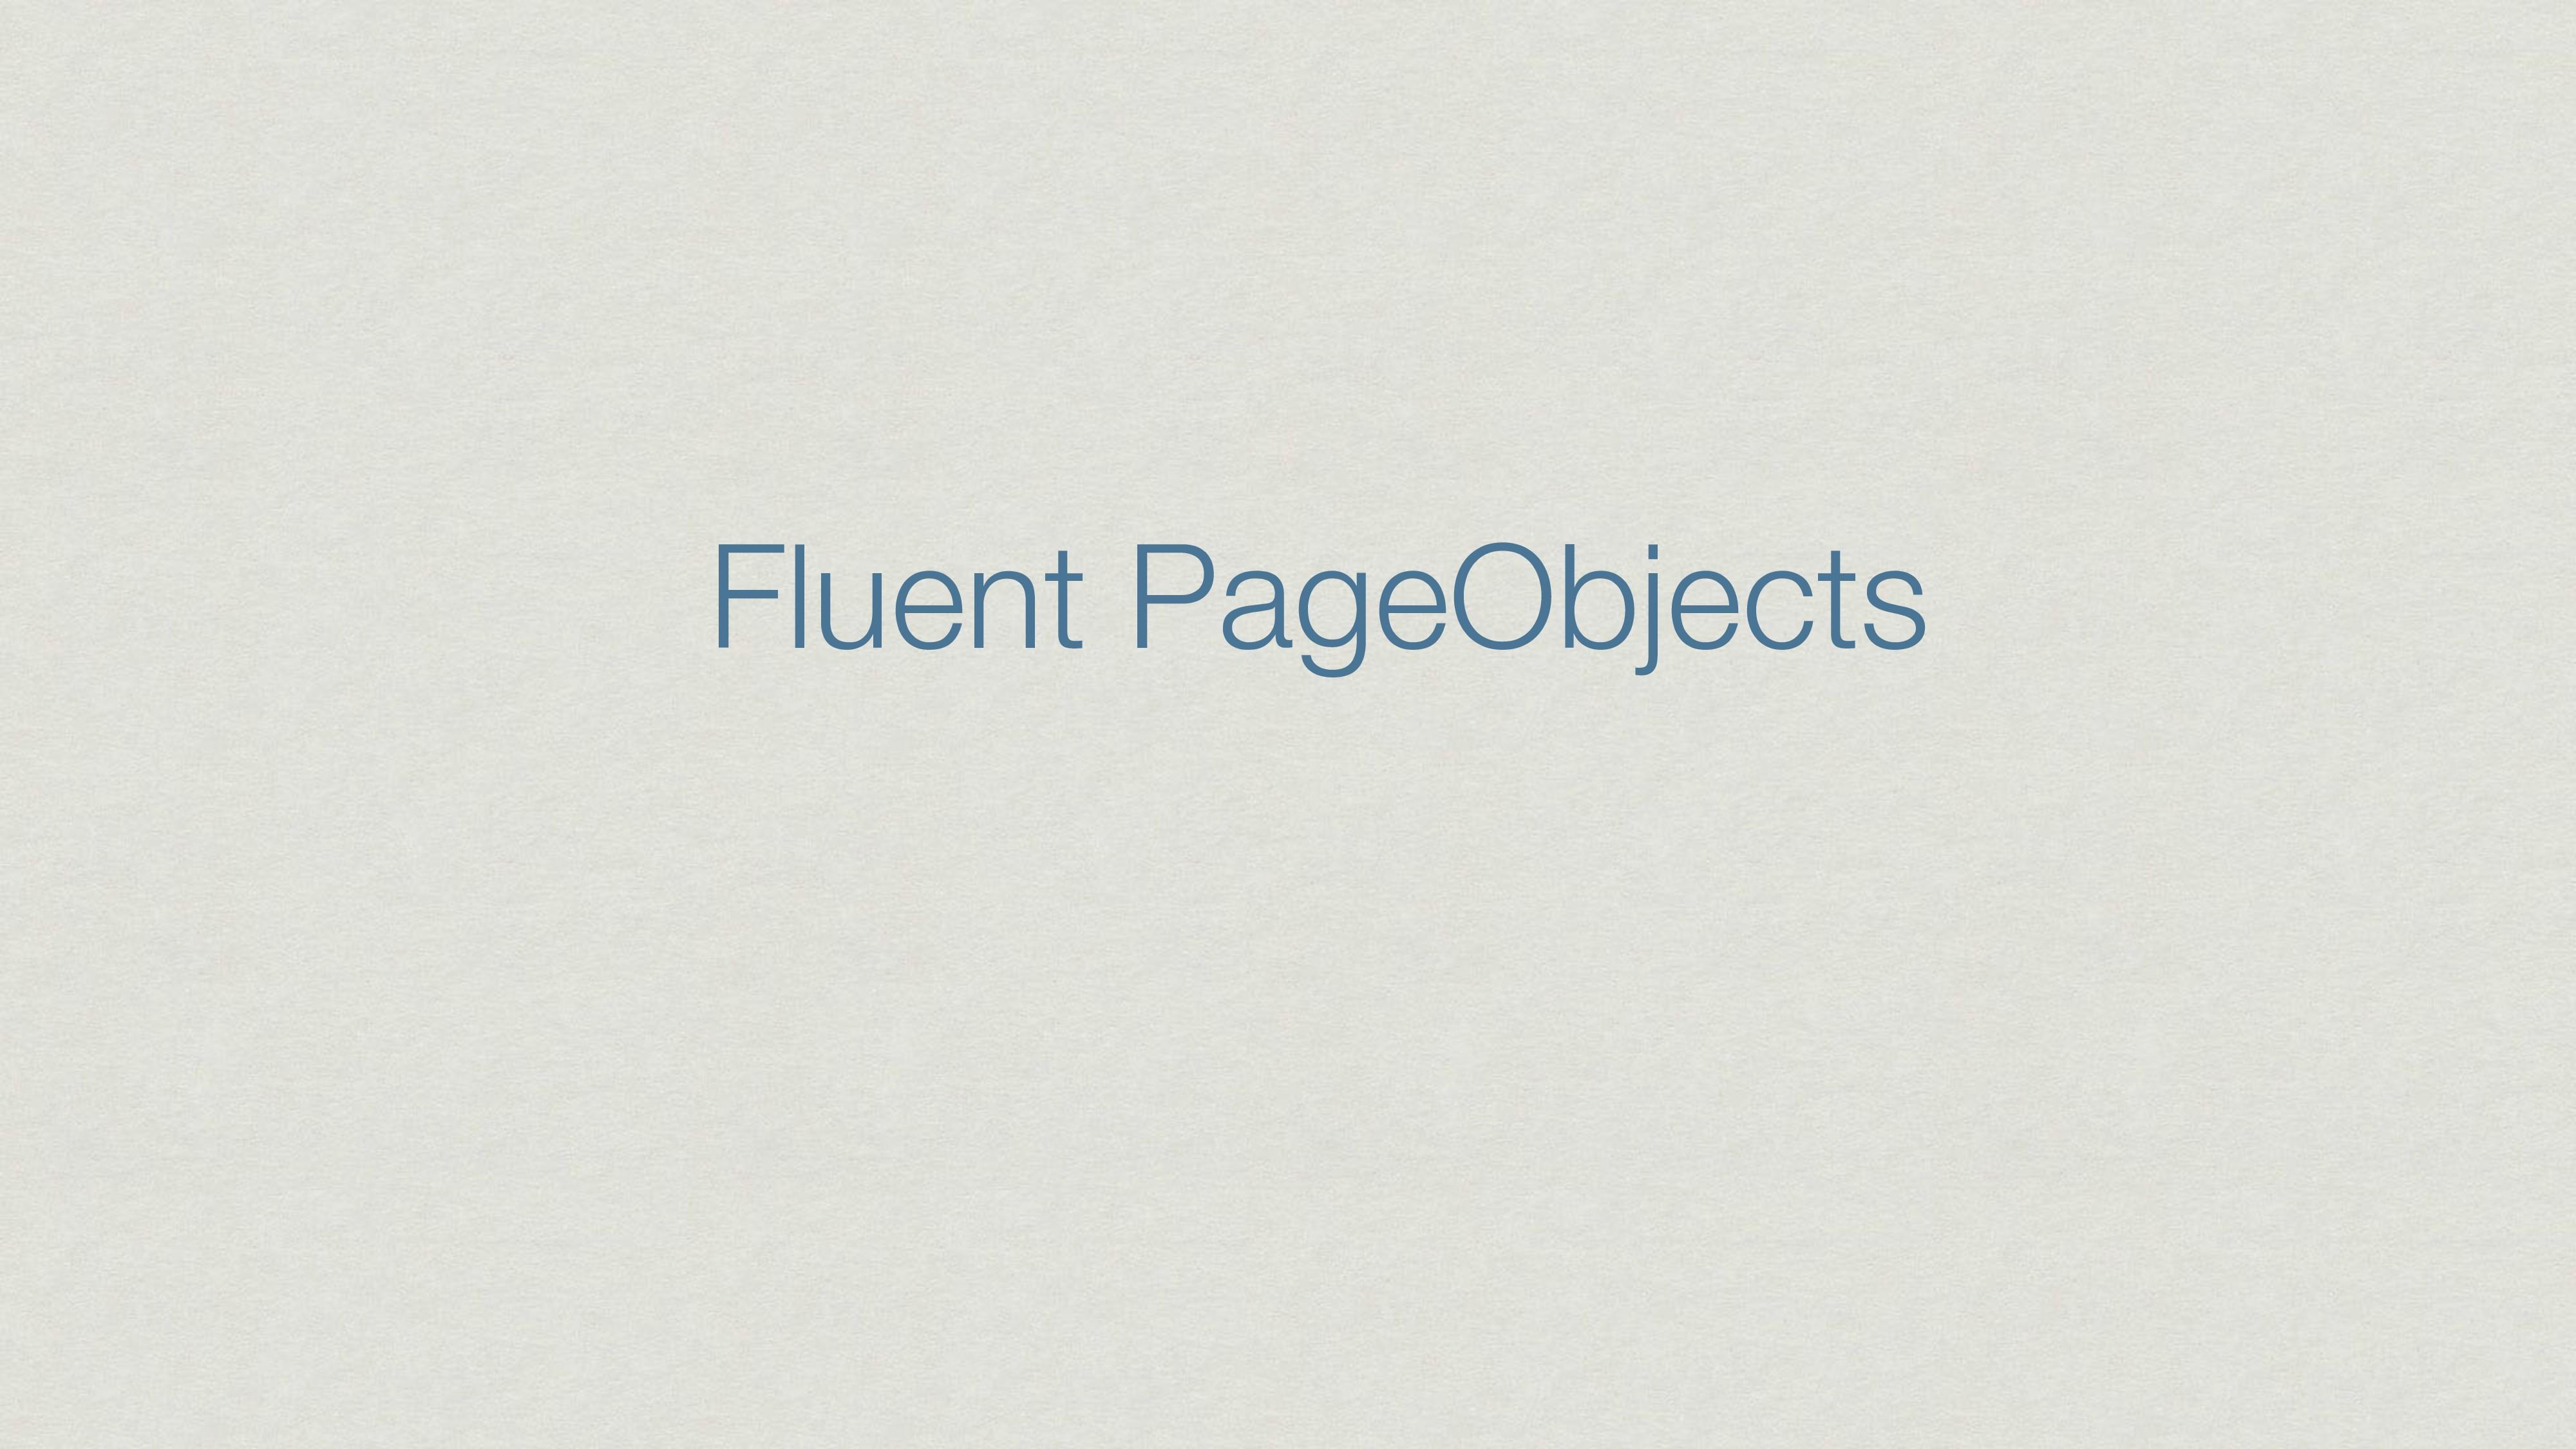 Fluent PageObjects